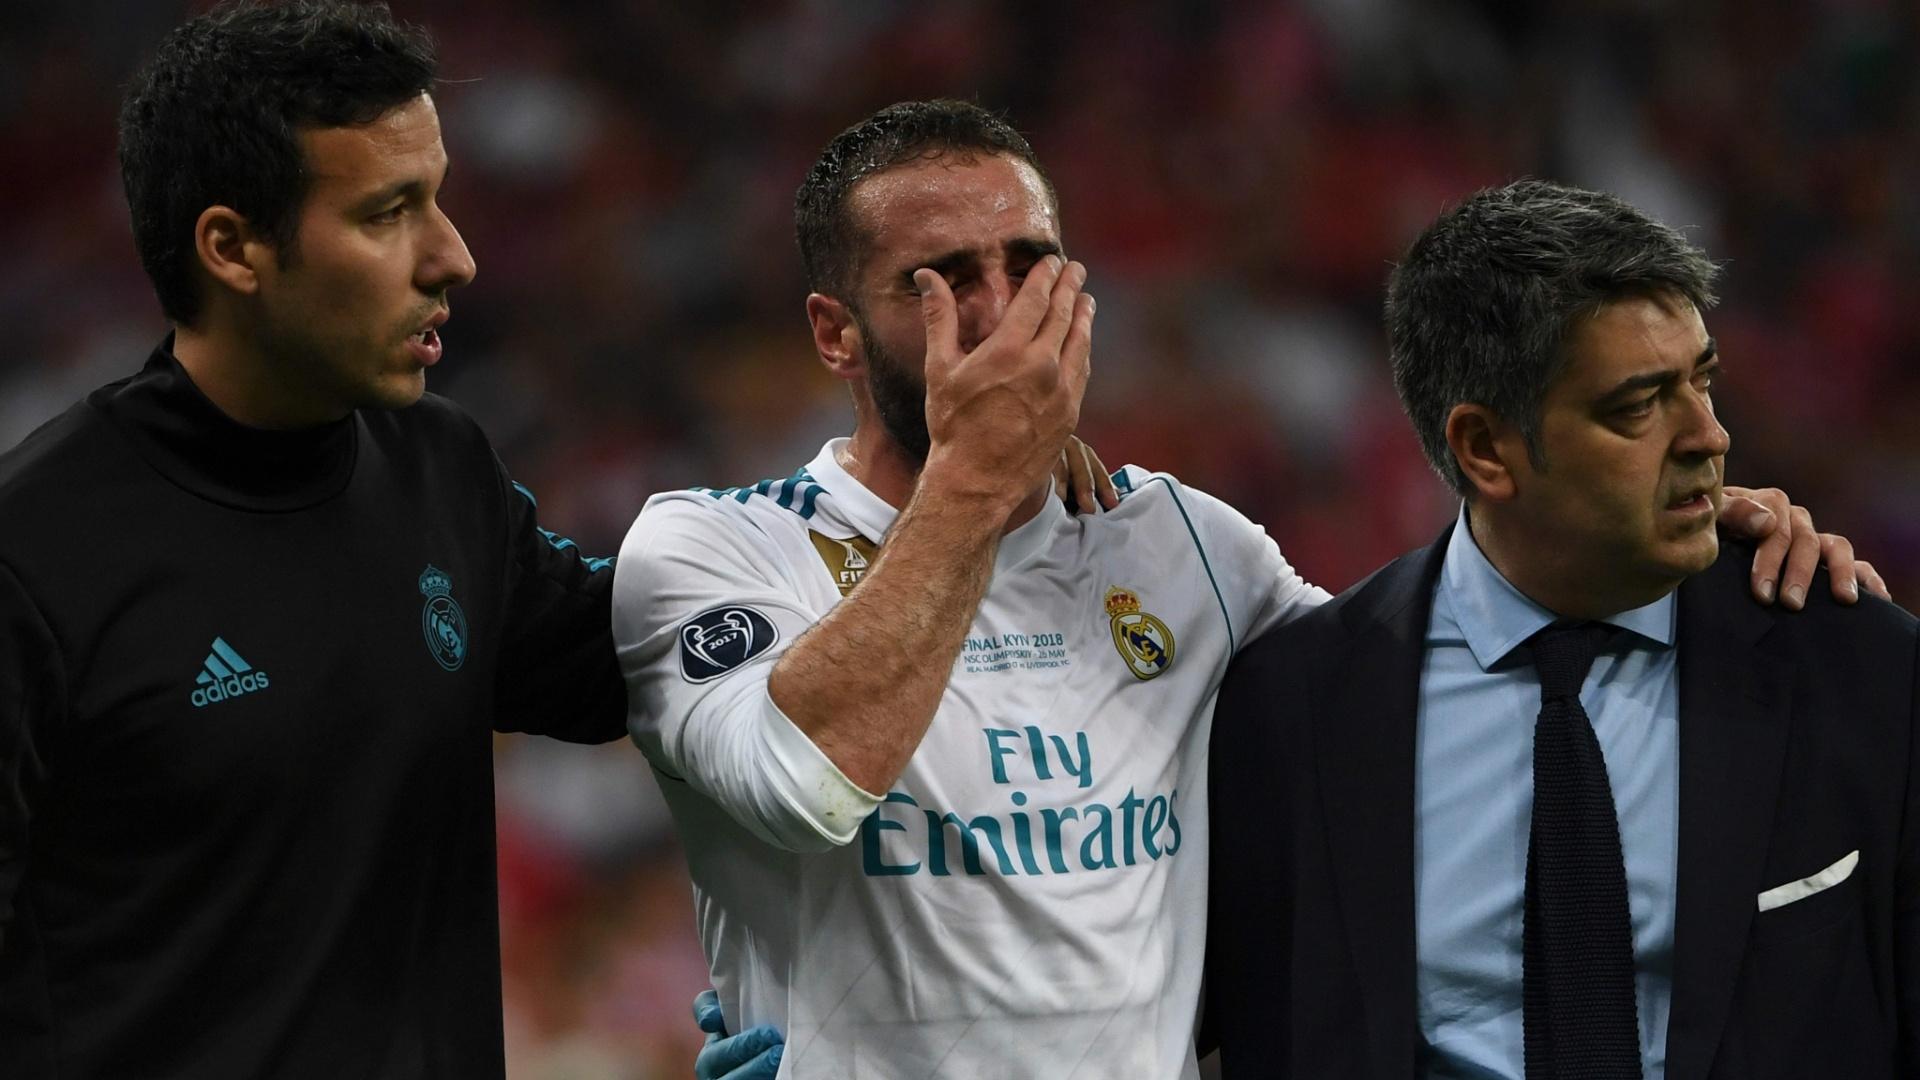 Carvajal Real Madrid choro